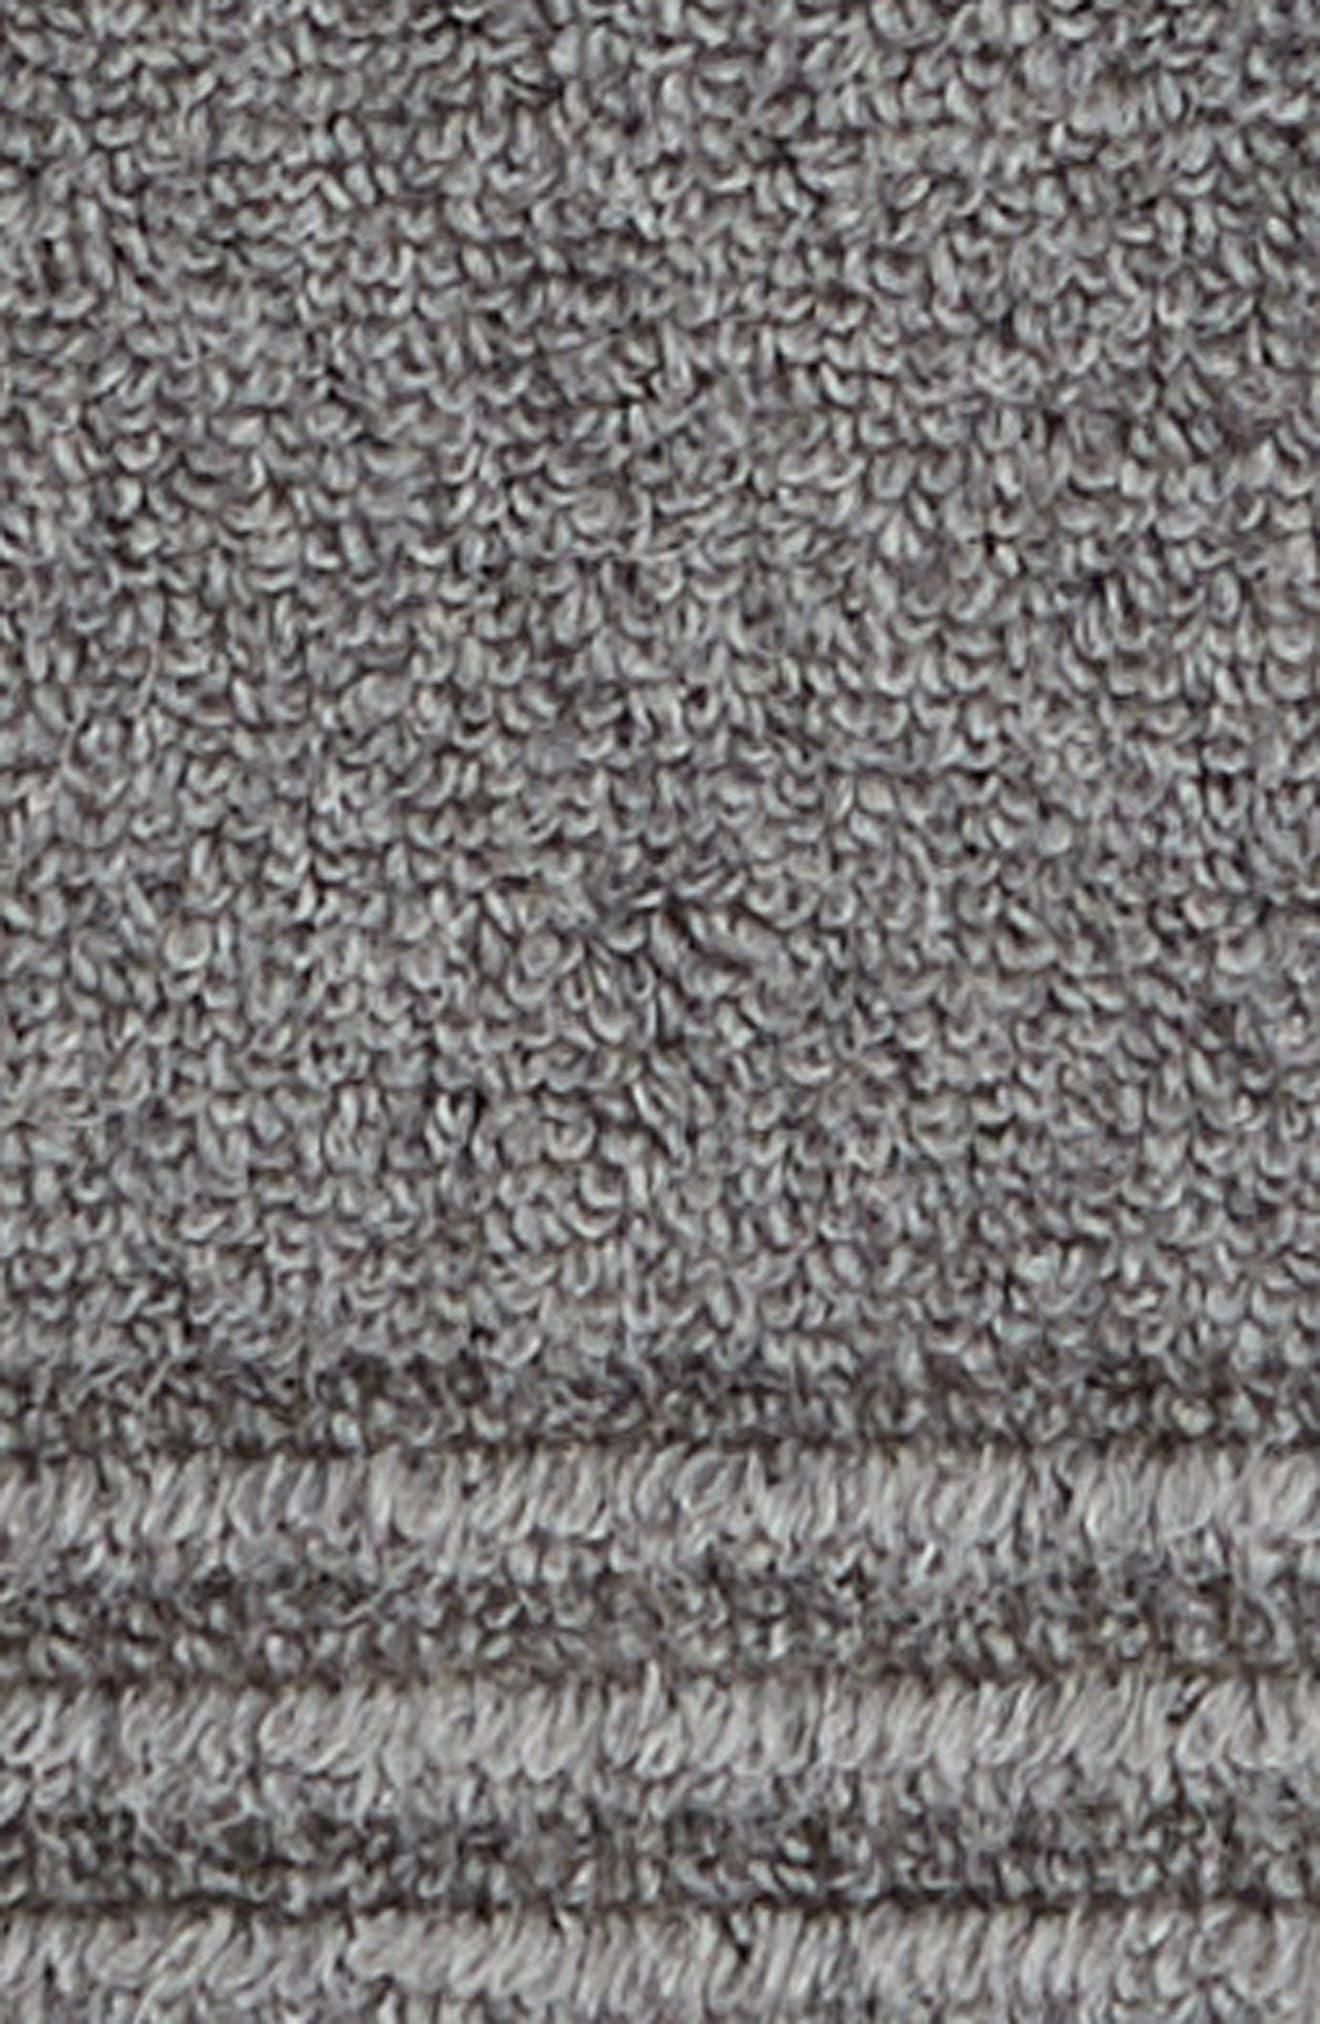 Organic Hydrocotton Bath Towel,                             Alternate thumbnail 3, color,                             GREY PEARL